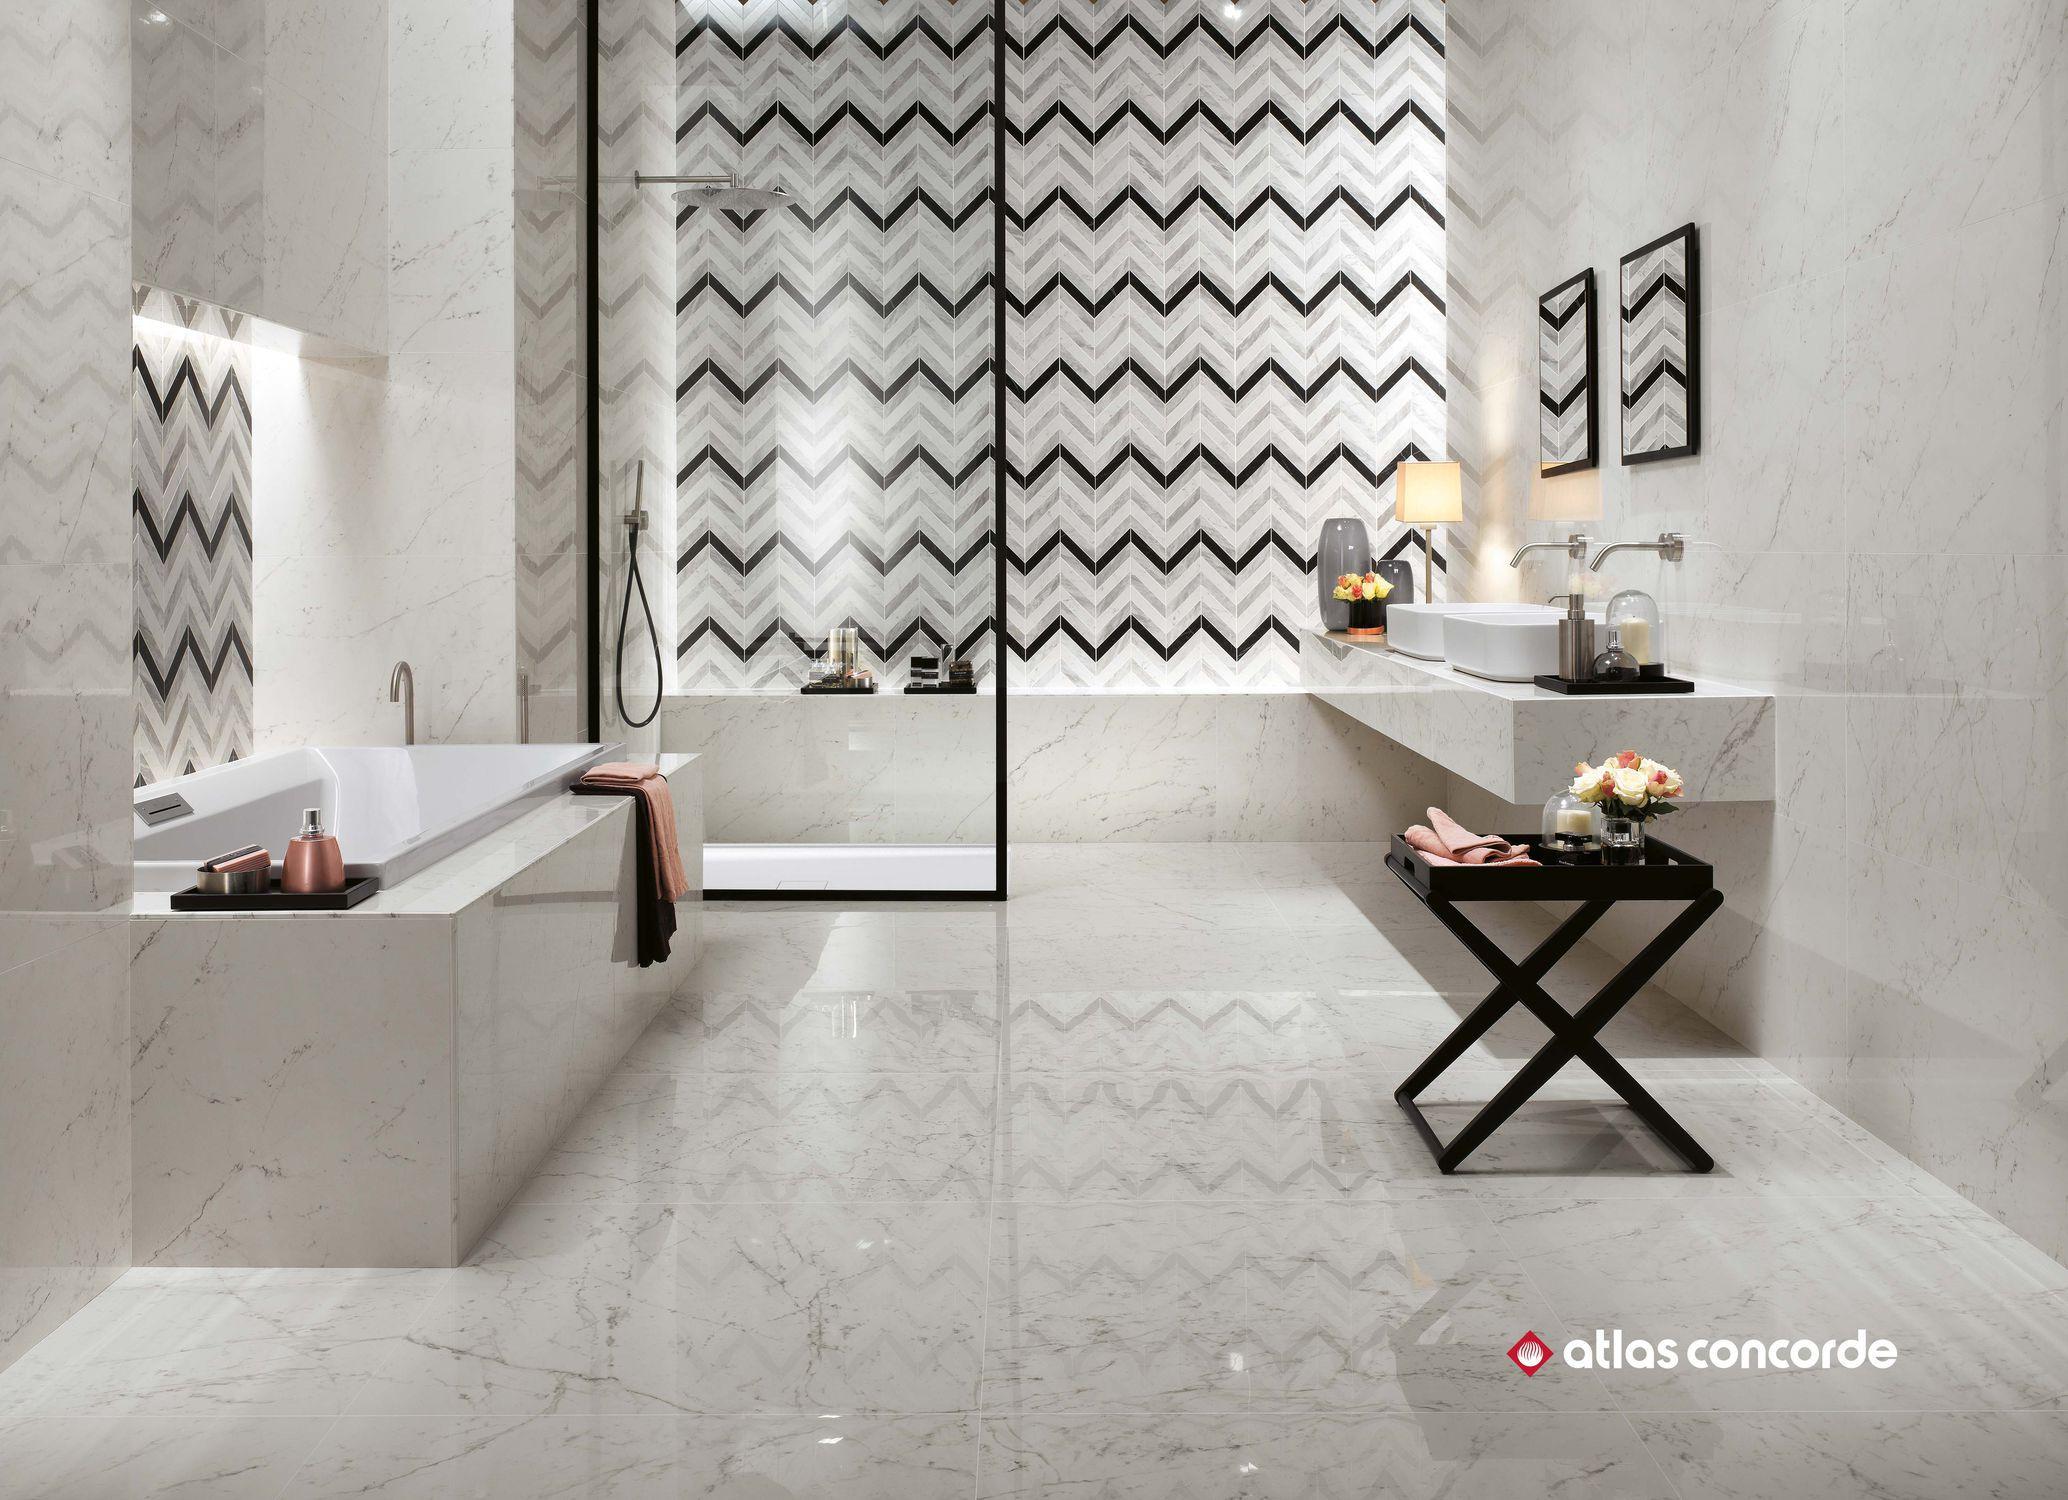 Atlas Concorde indoor tile wall porcelain stoneware matte marvel